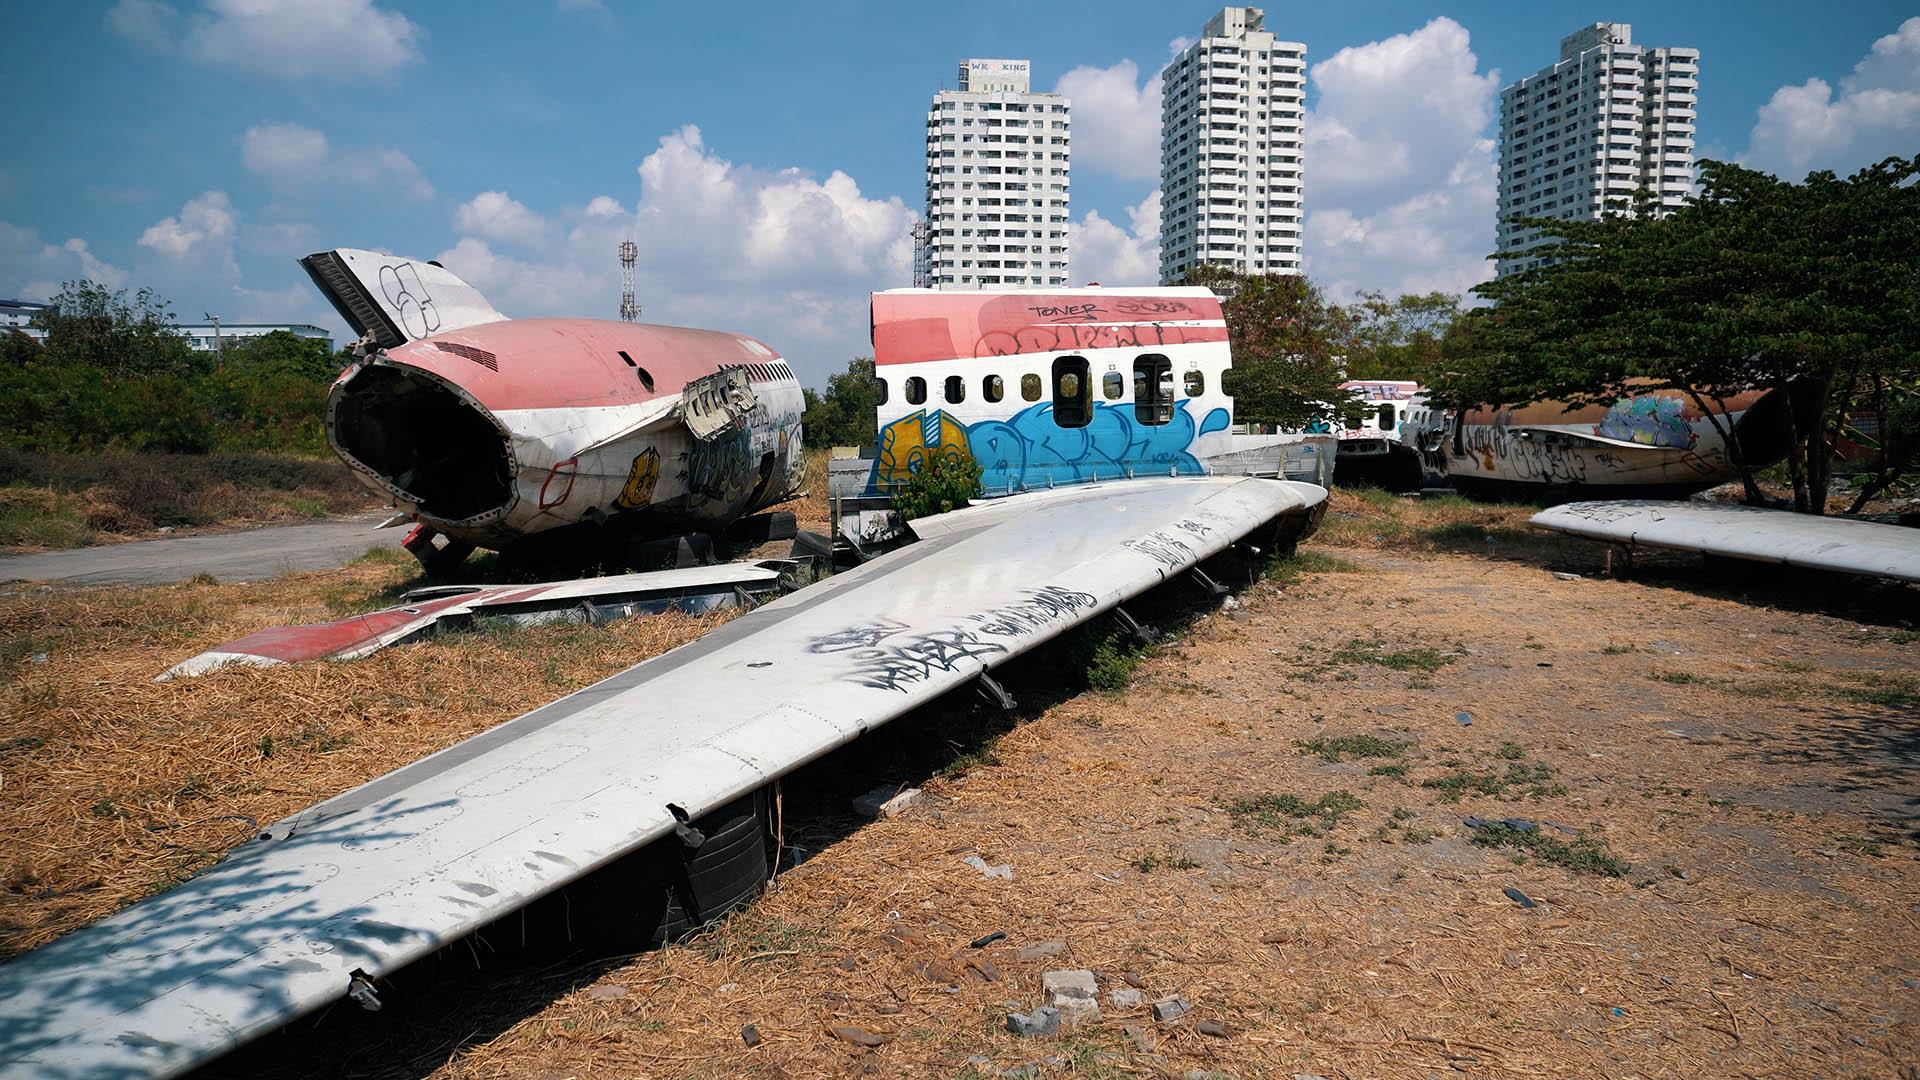 Wracks am Flugzeugfriedhof in Bangkok